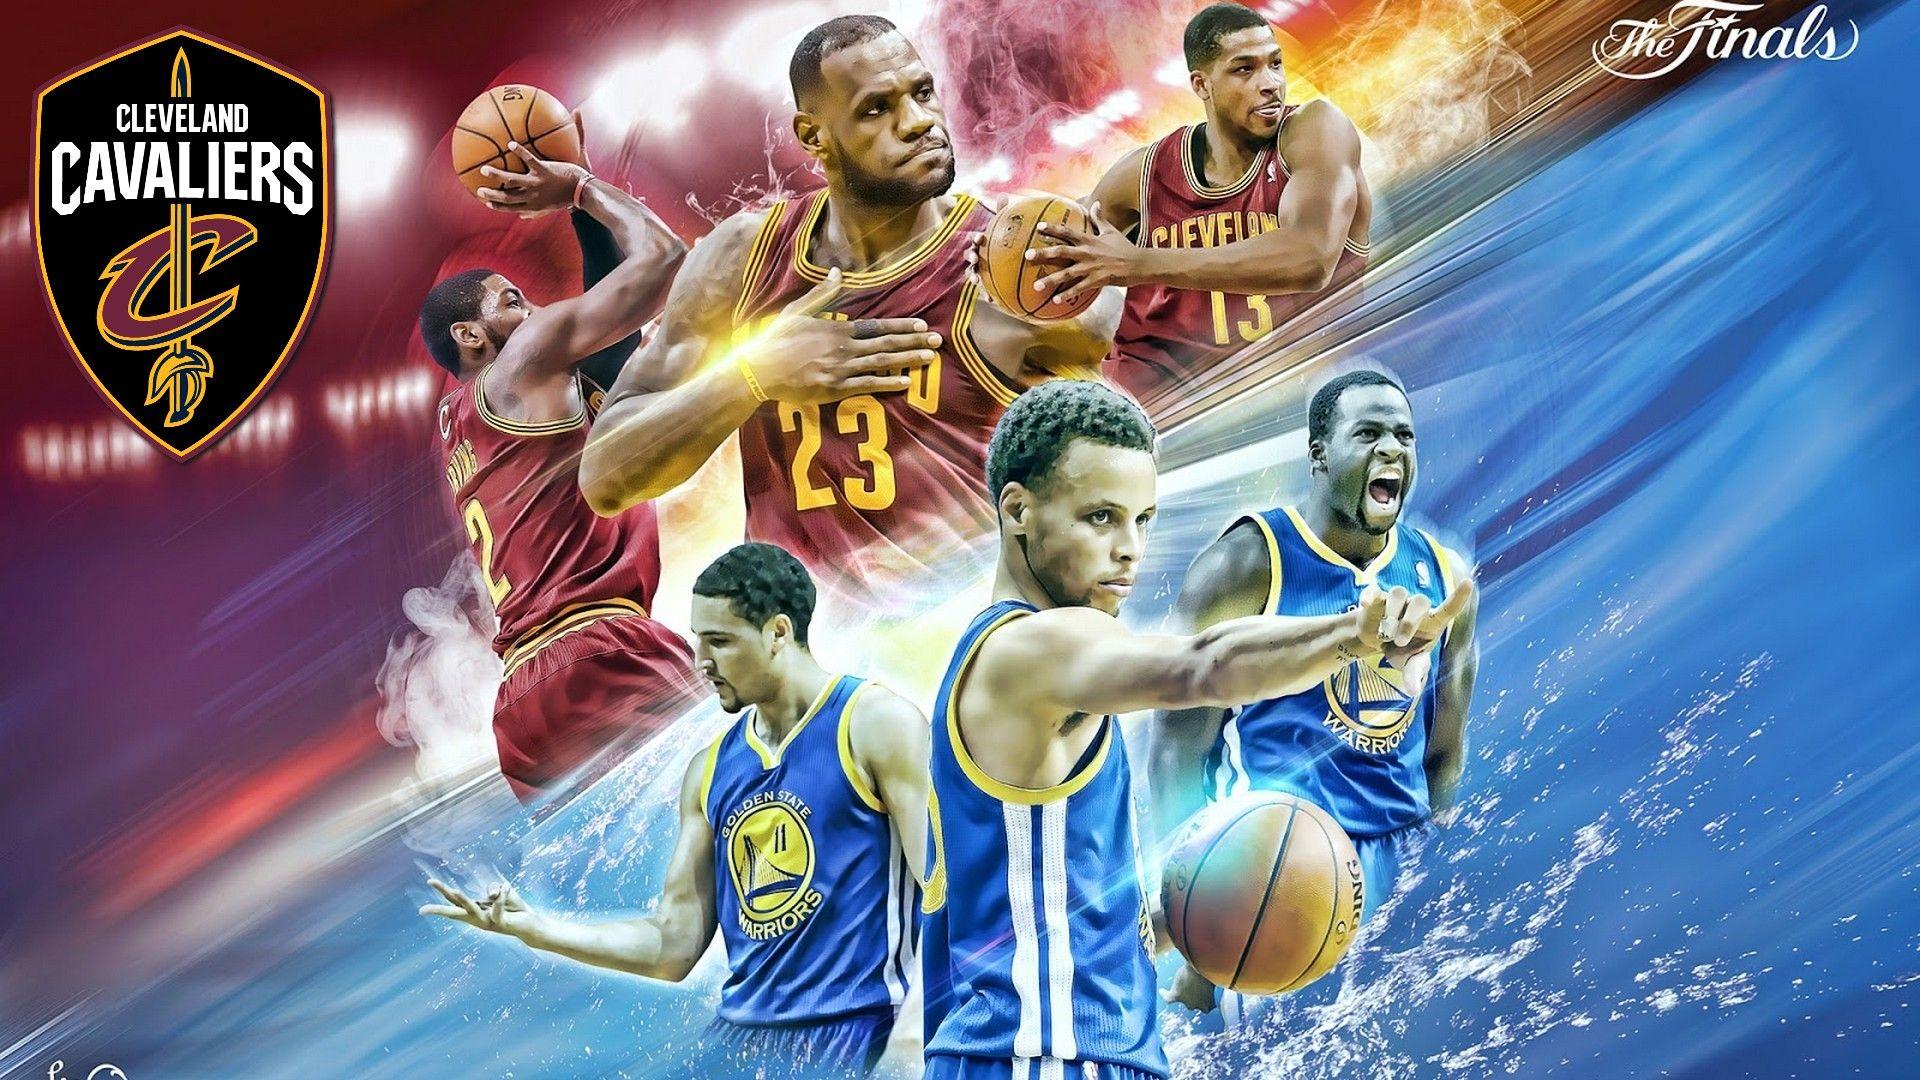 Big 3 Cleveland Cavaliers Wallpaper 2021 Basketball Wallpaper Nba Wallpapers Lebron James Cleveland Sports Wallpapers